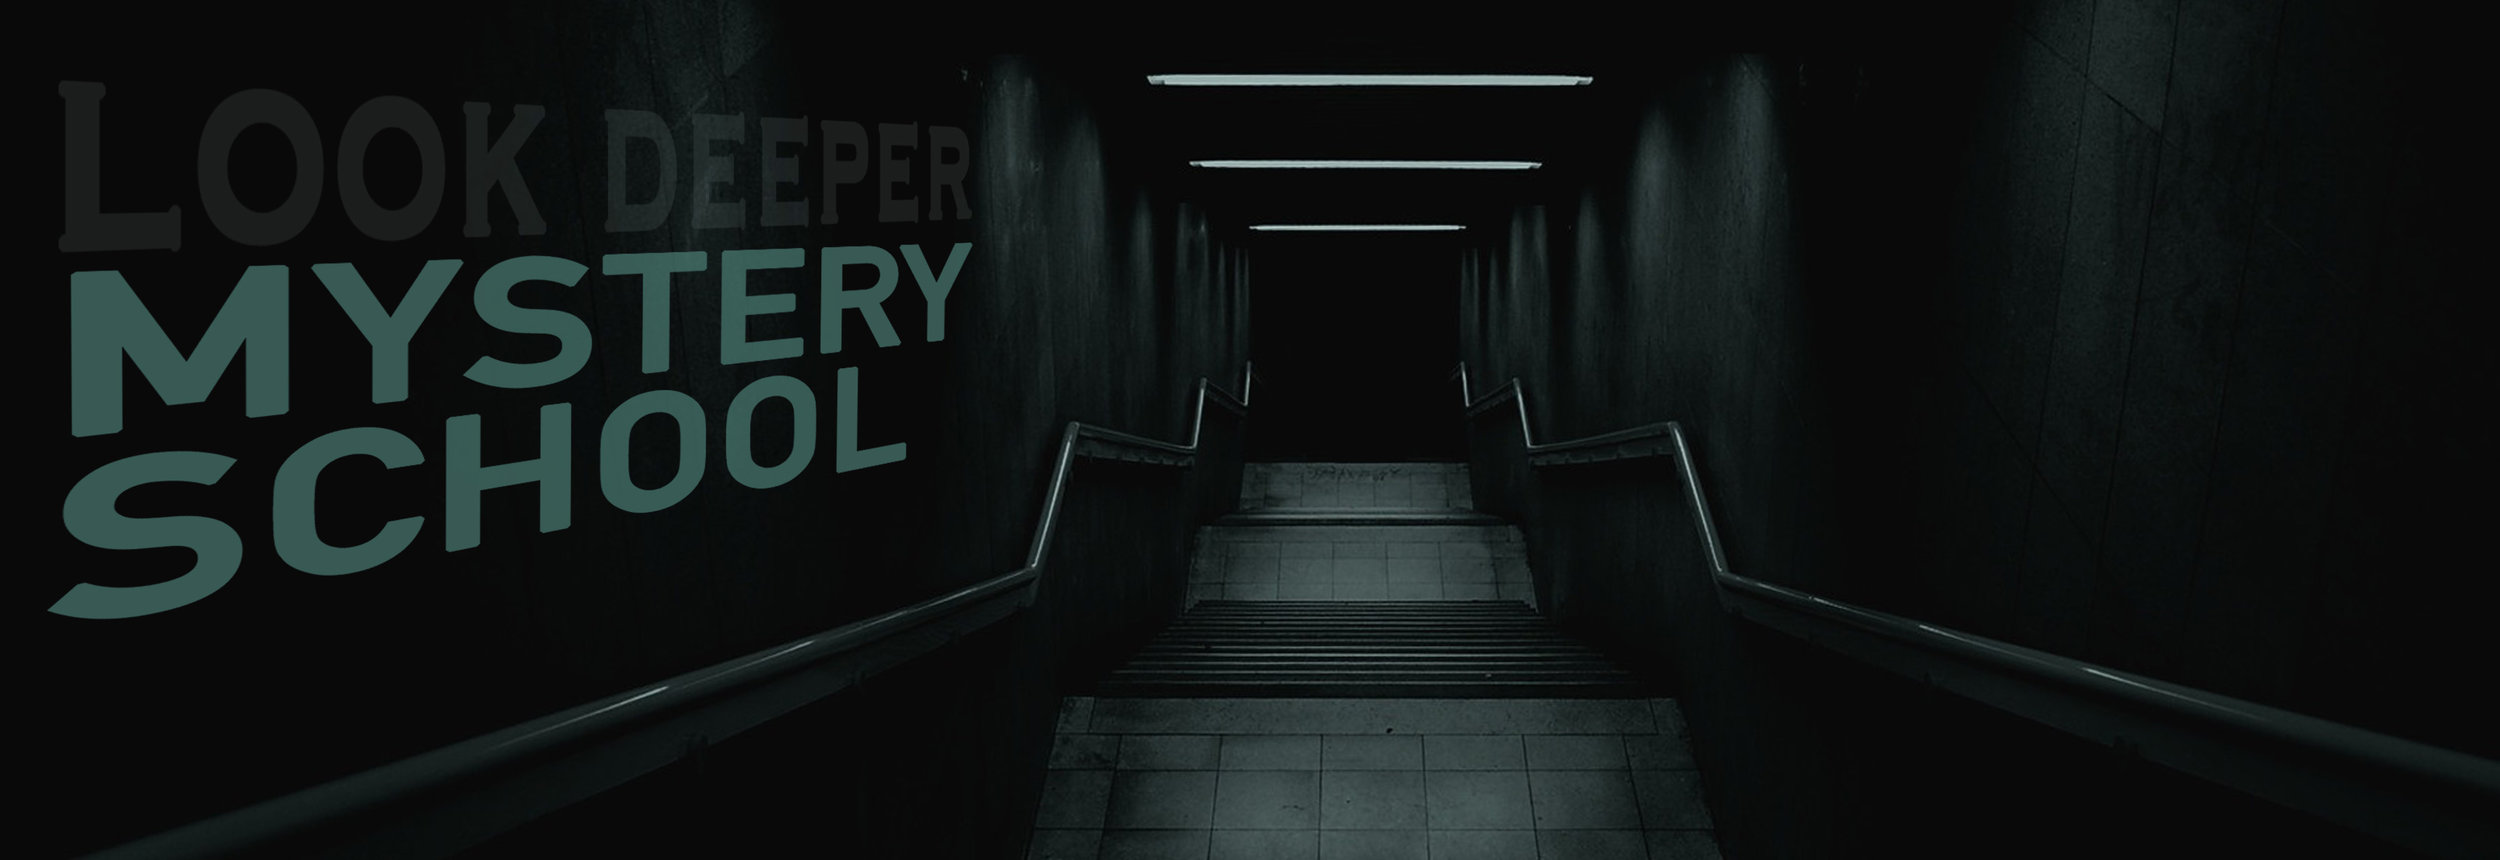 mystery school click banner.jpg